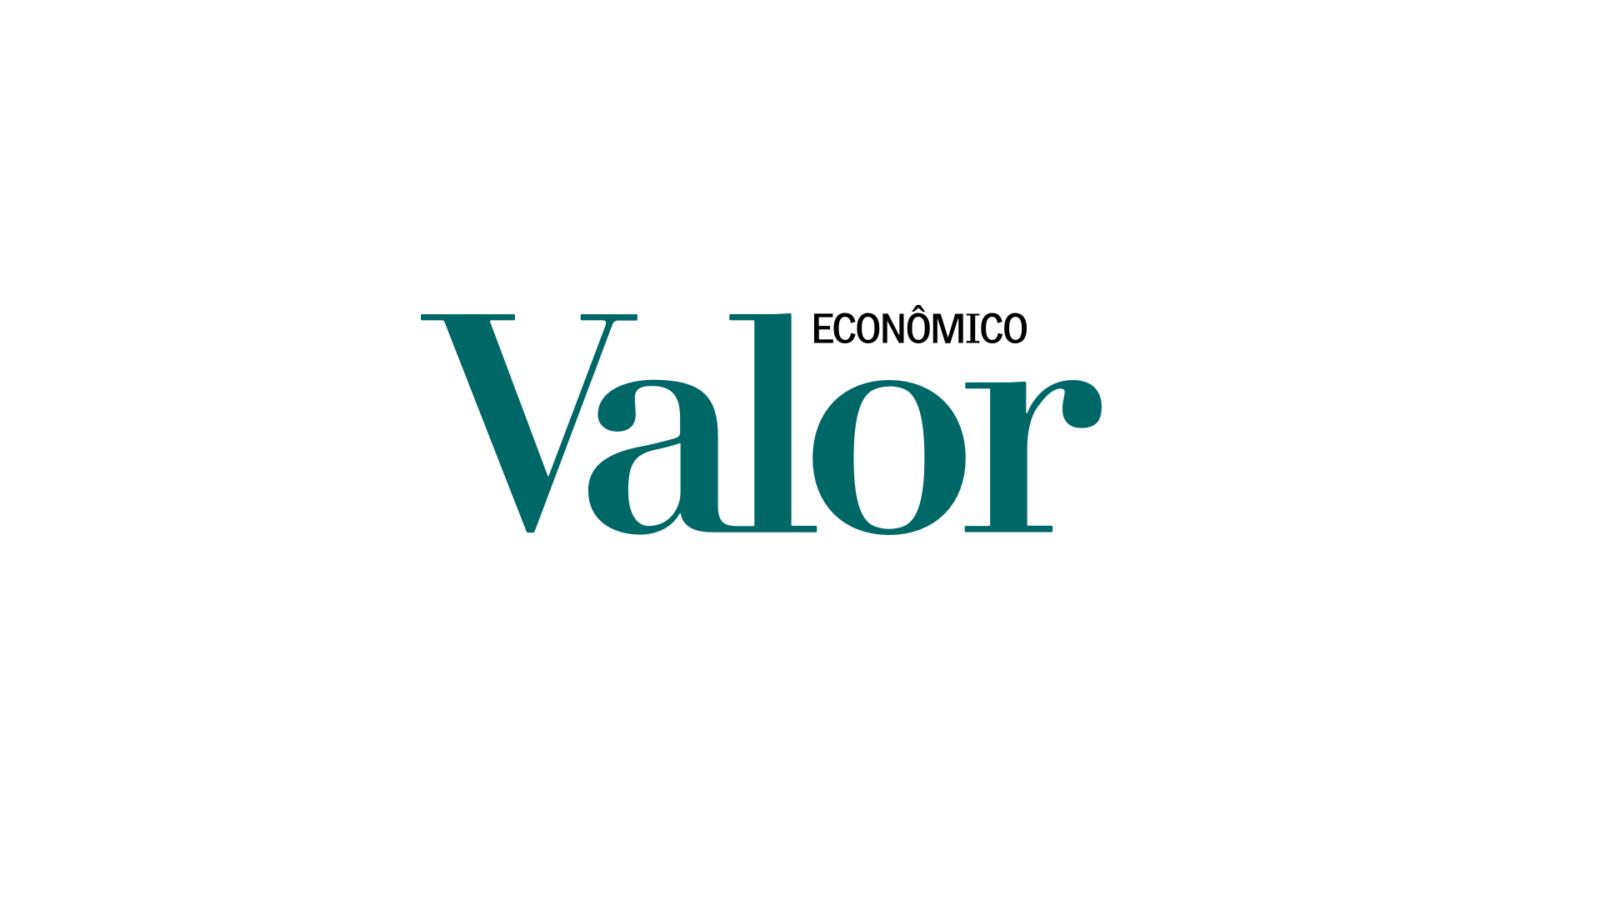 noticias-roraima-energina-renovavel-menor2